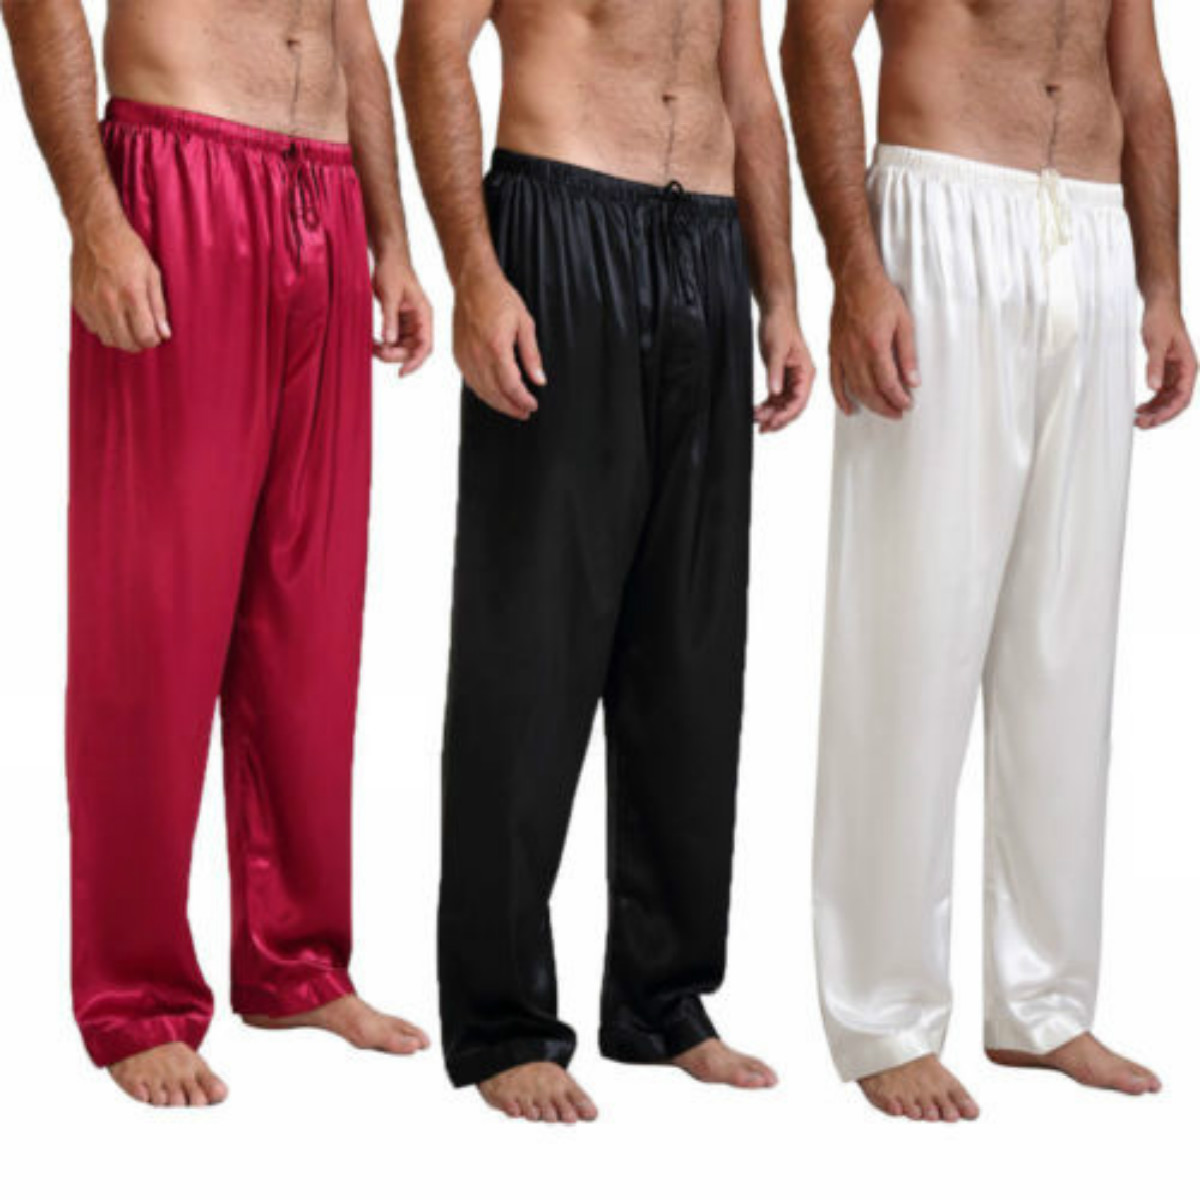 Sleep Buttoms Men Silk Satin Solid Casual Loung Pants Sleep Bottoms Sleepwear Pijama Hombre